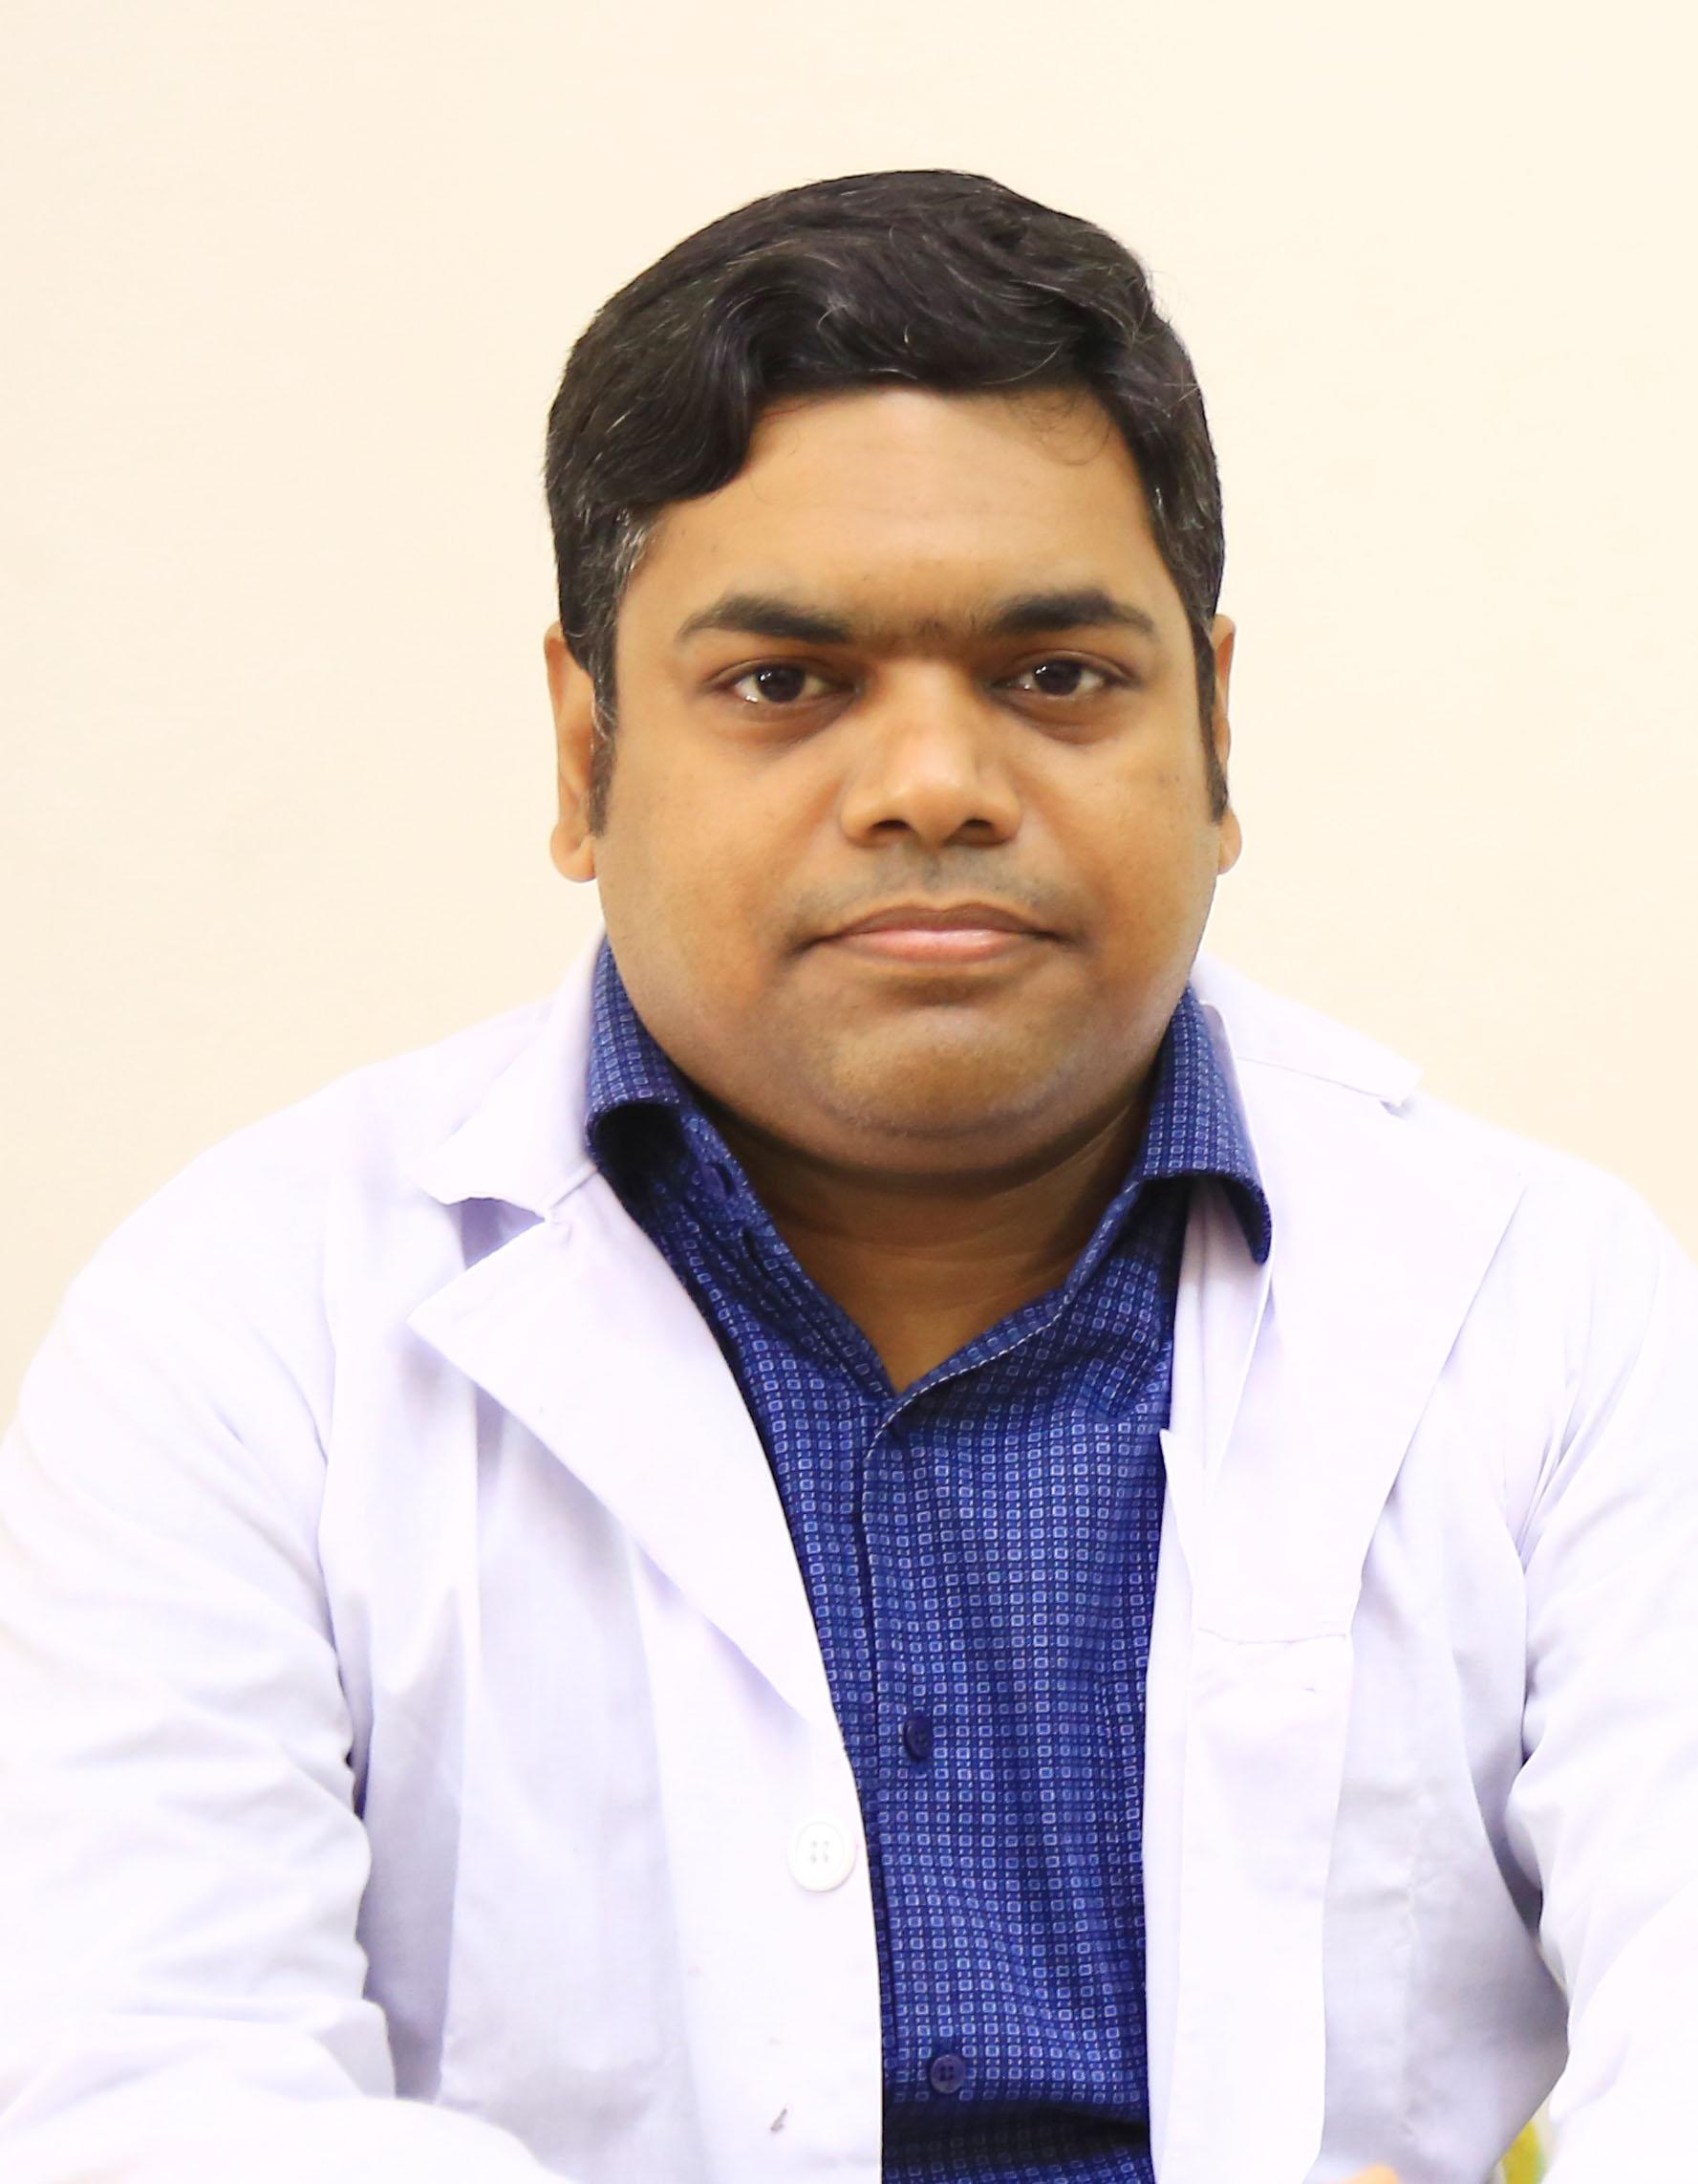 Dr. Muhammad Masudul Hassan Arup